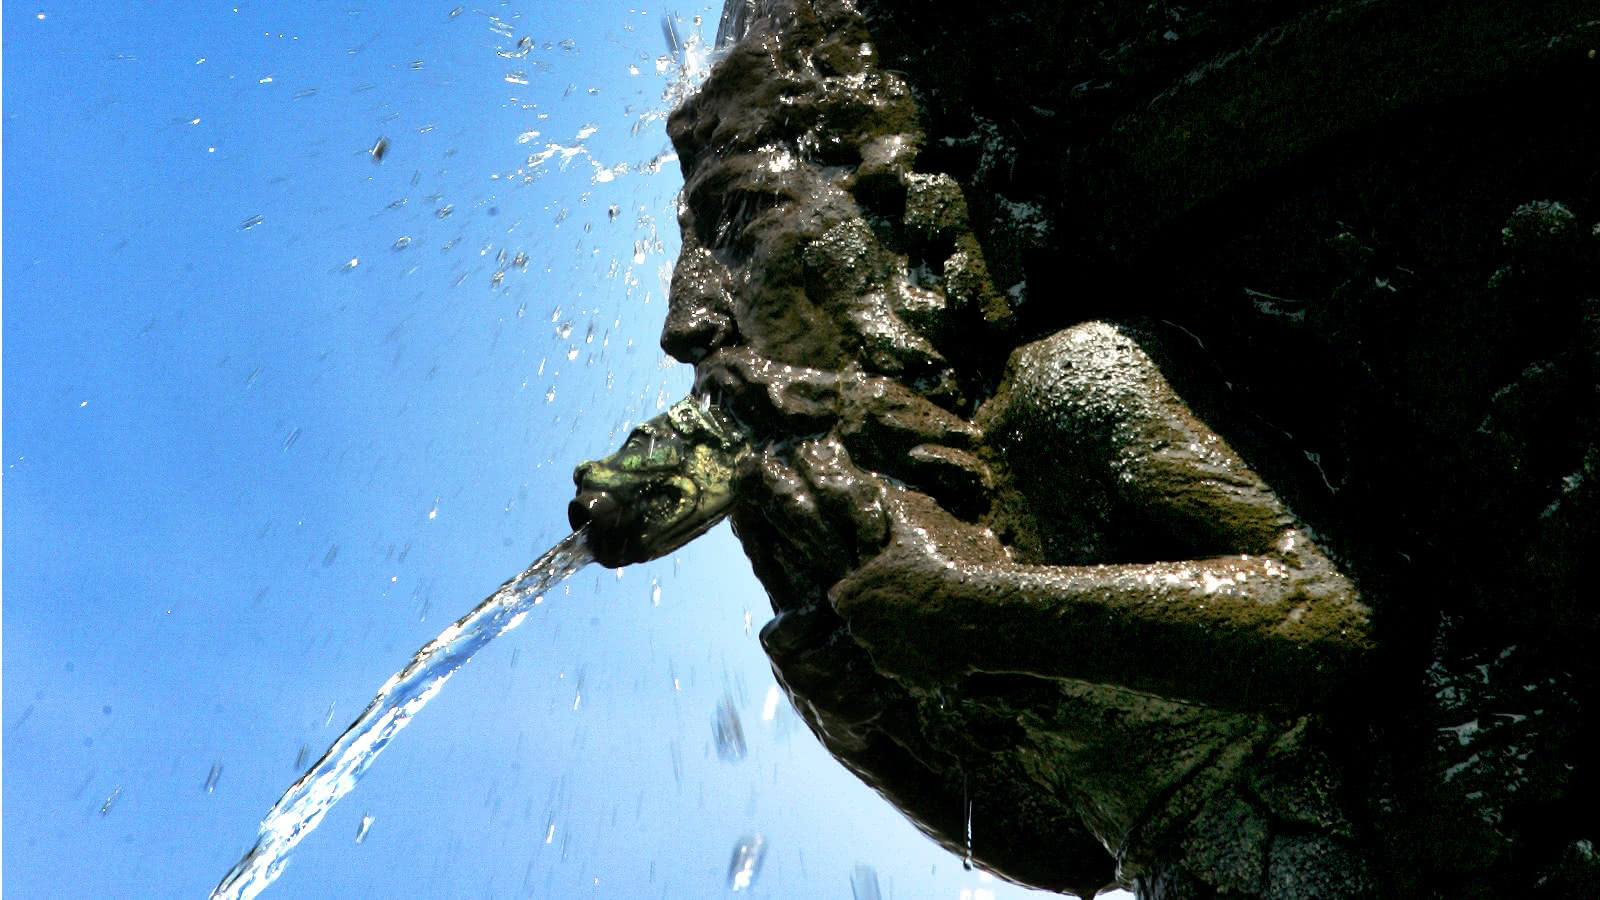 Fontaine d'Amboise